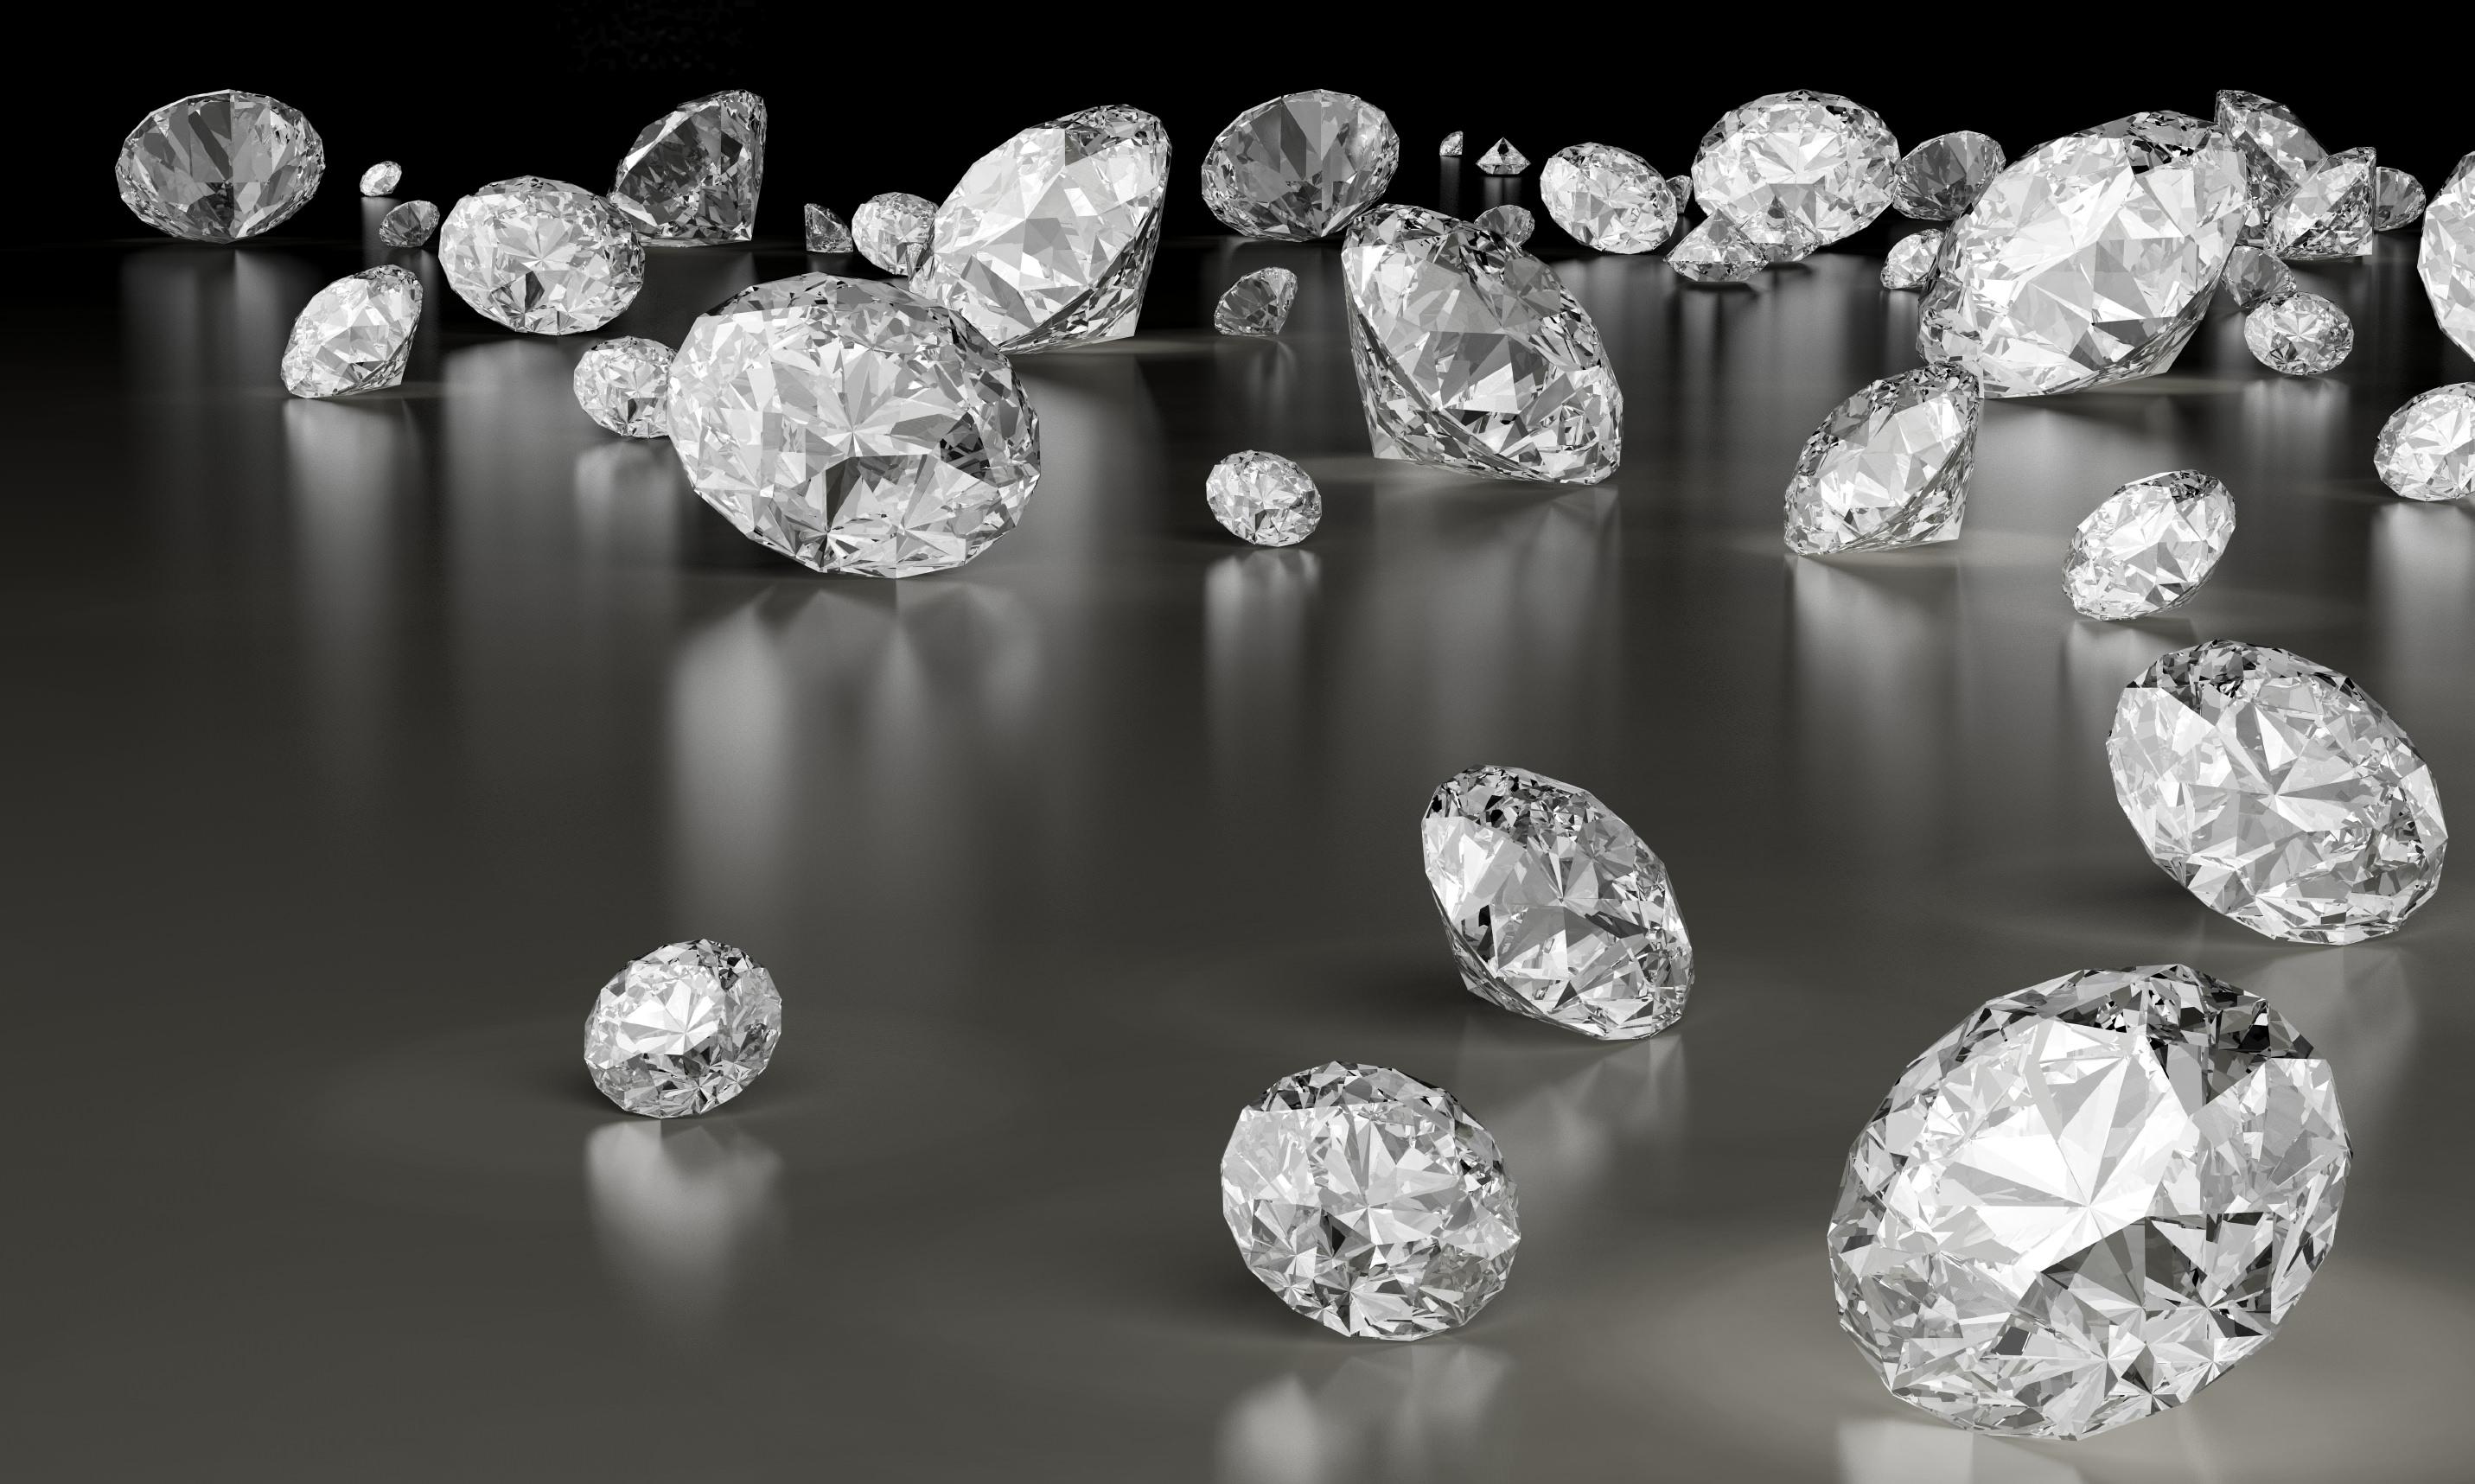 diamante de sangue3